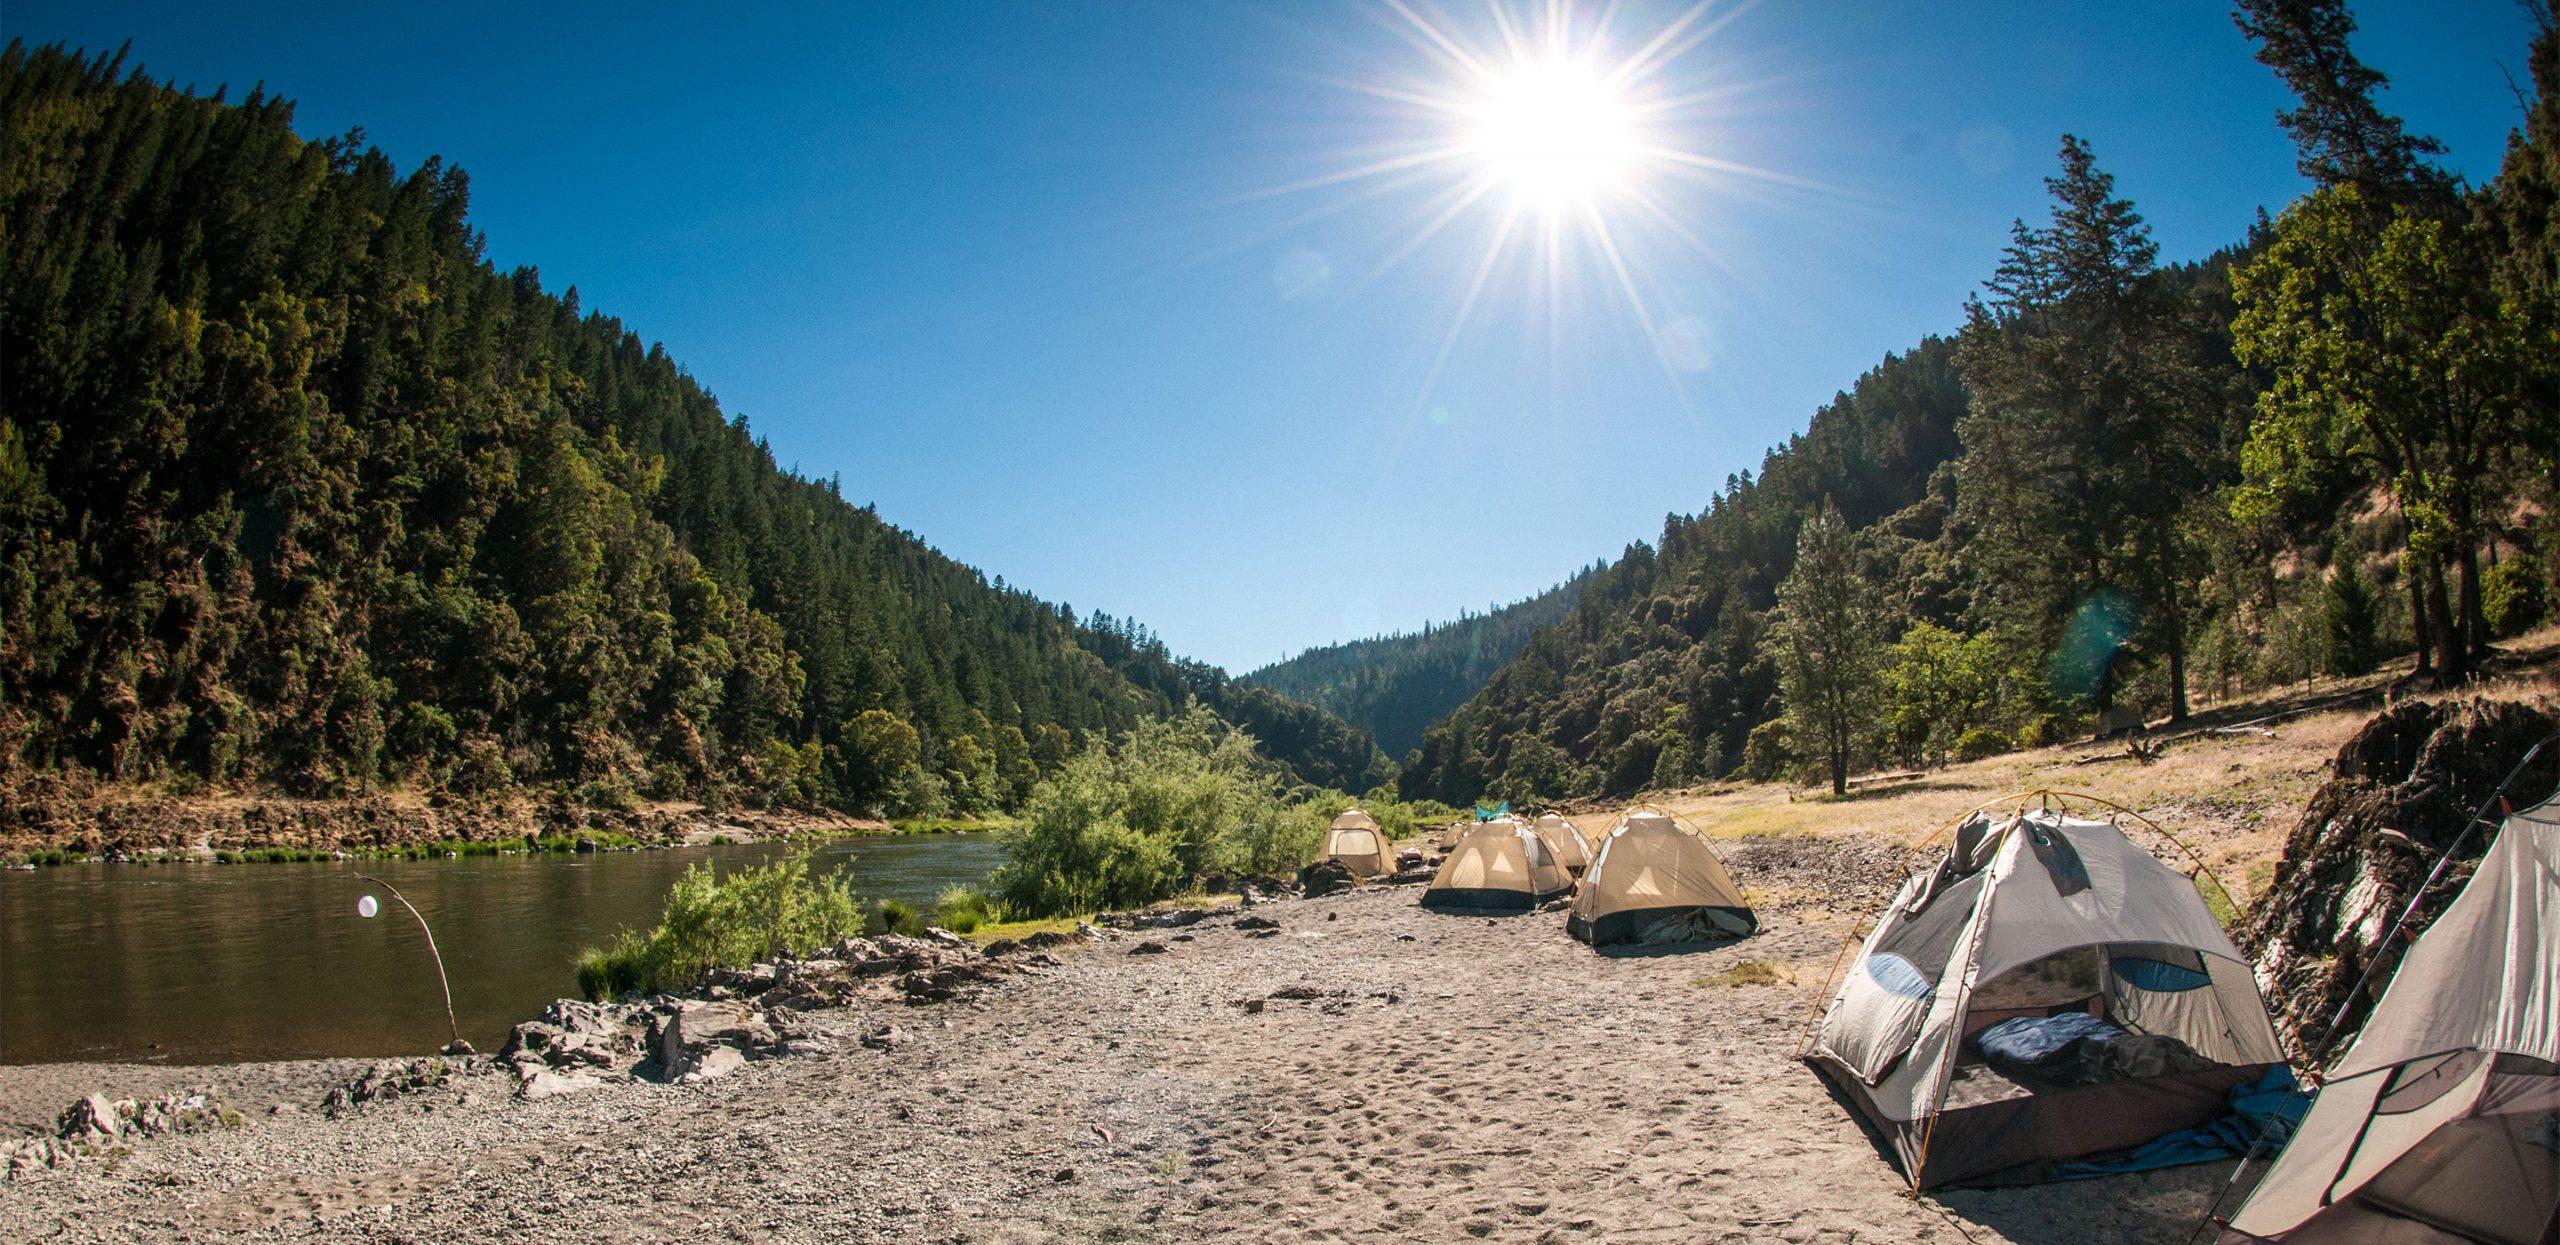 Rogue River Rafting - Rogue 4-Day Camp Trip